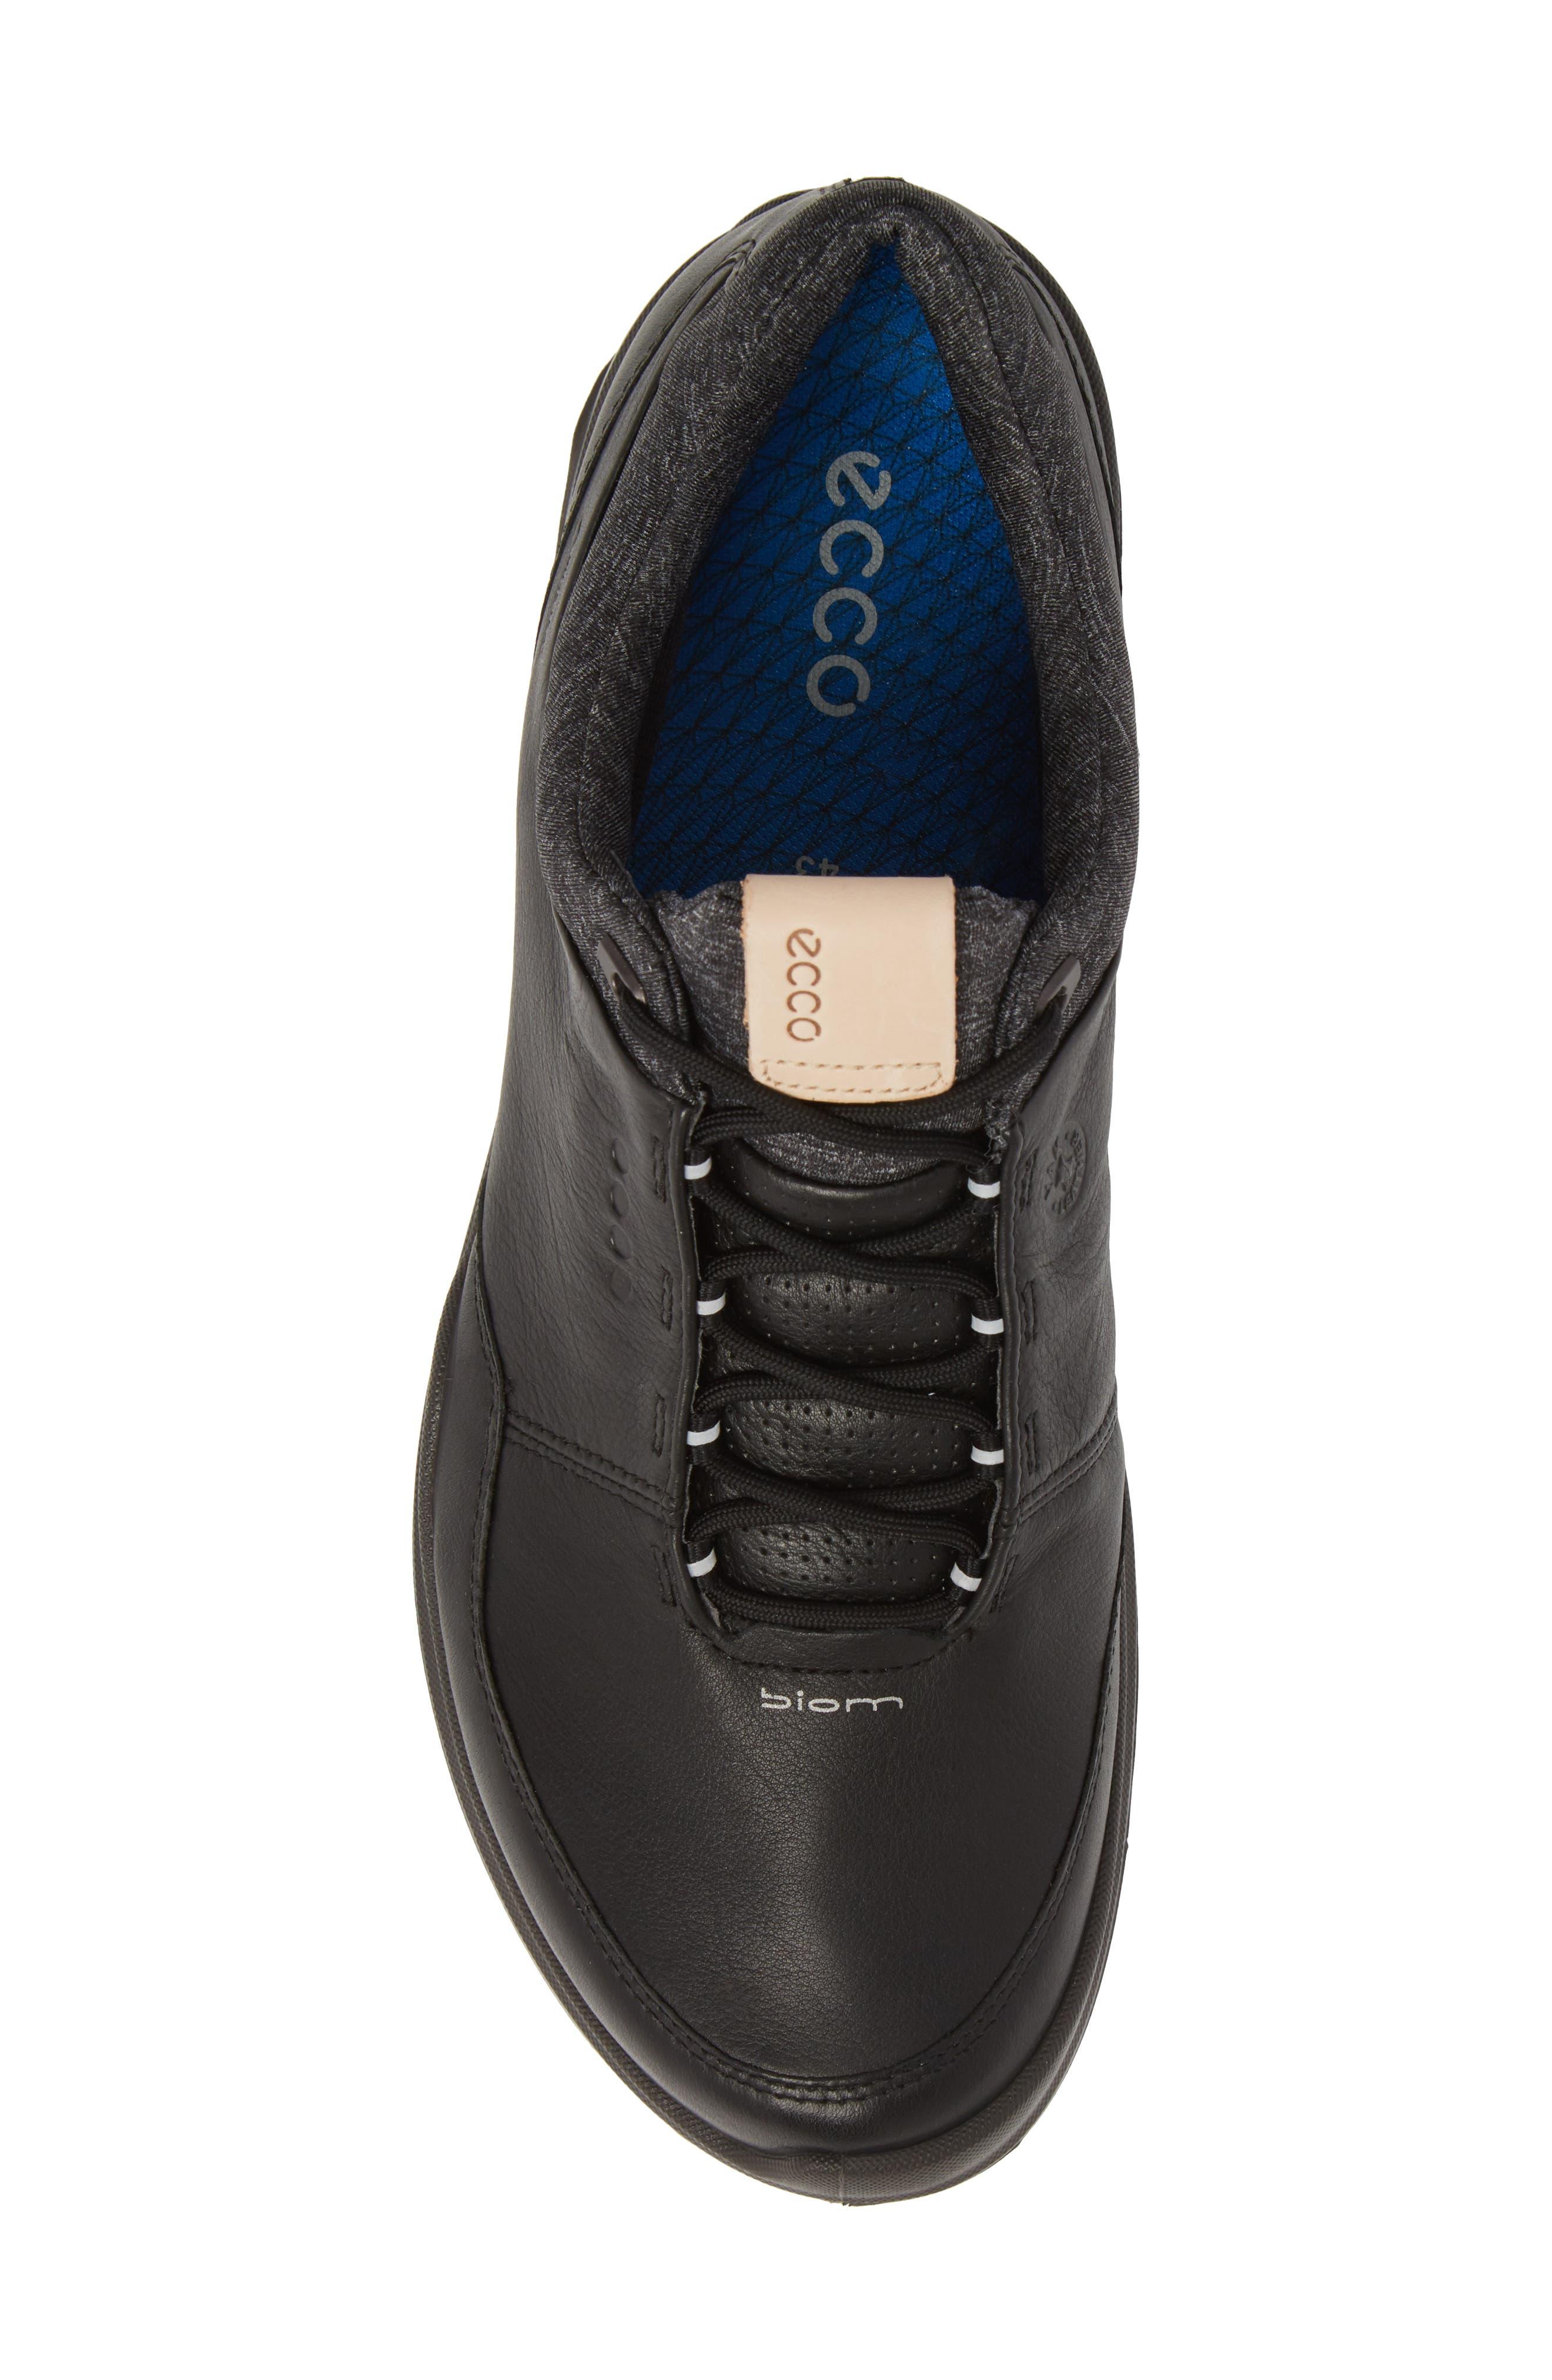 BIOM Hybrid 3 Gore-Tex<sup>®</sup> Golf Shoe,                             Alternate thumbnail 5, color,                             Black/ Bermuda Blue Leather